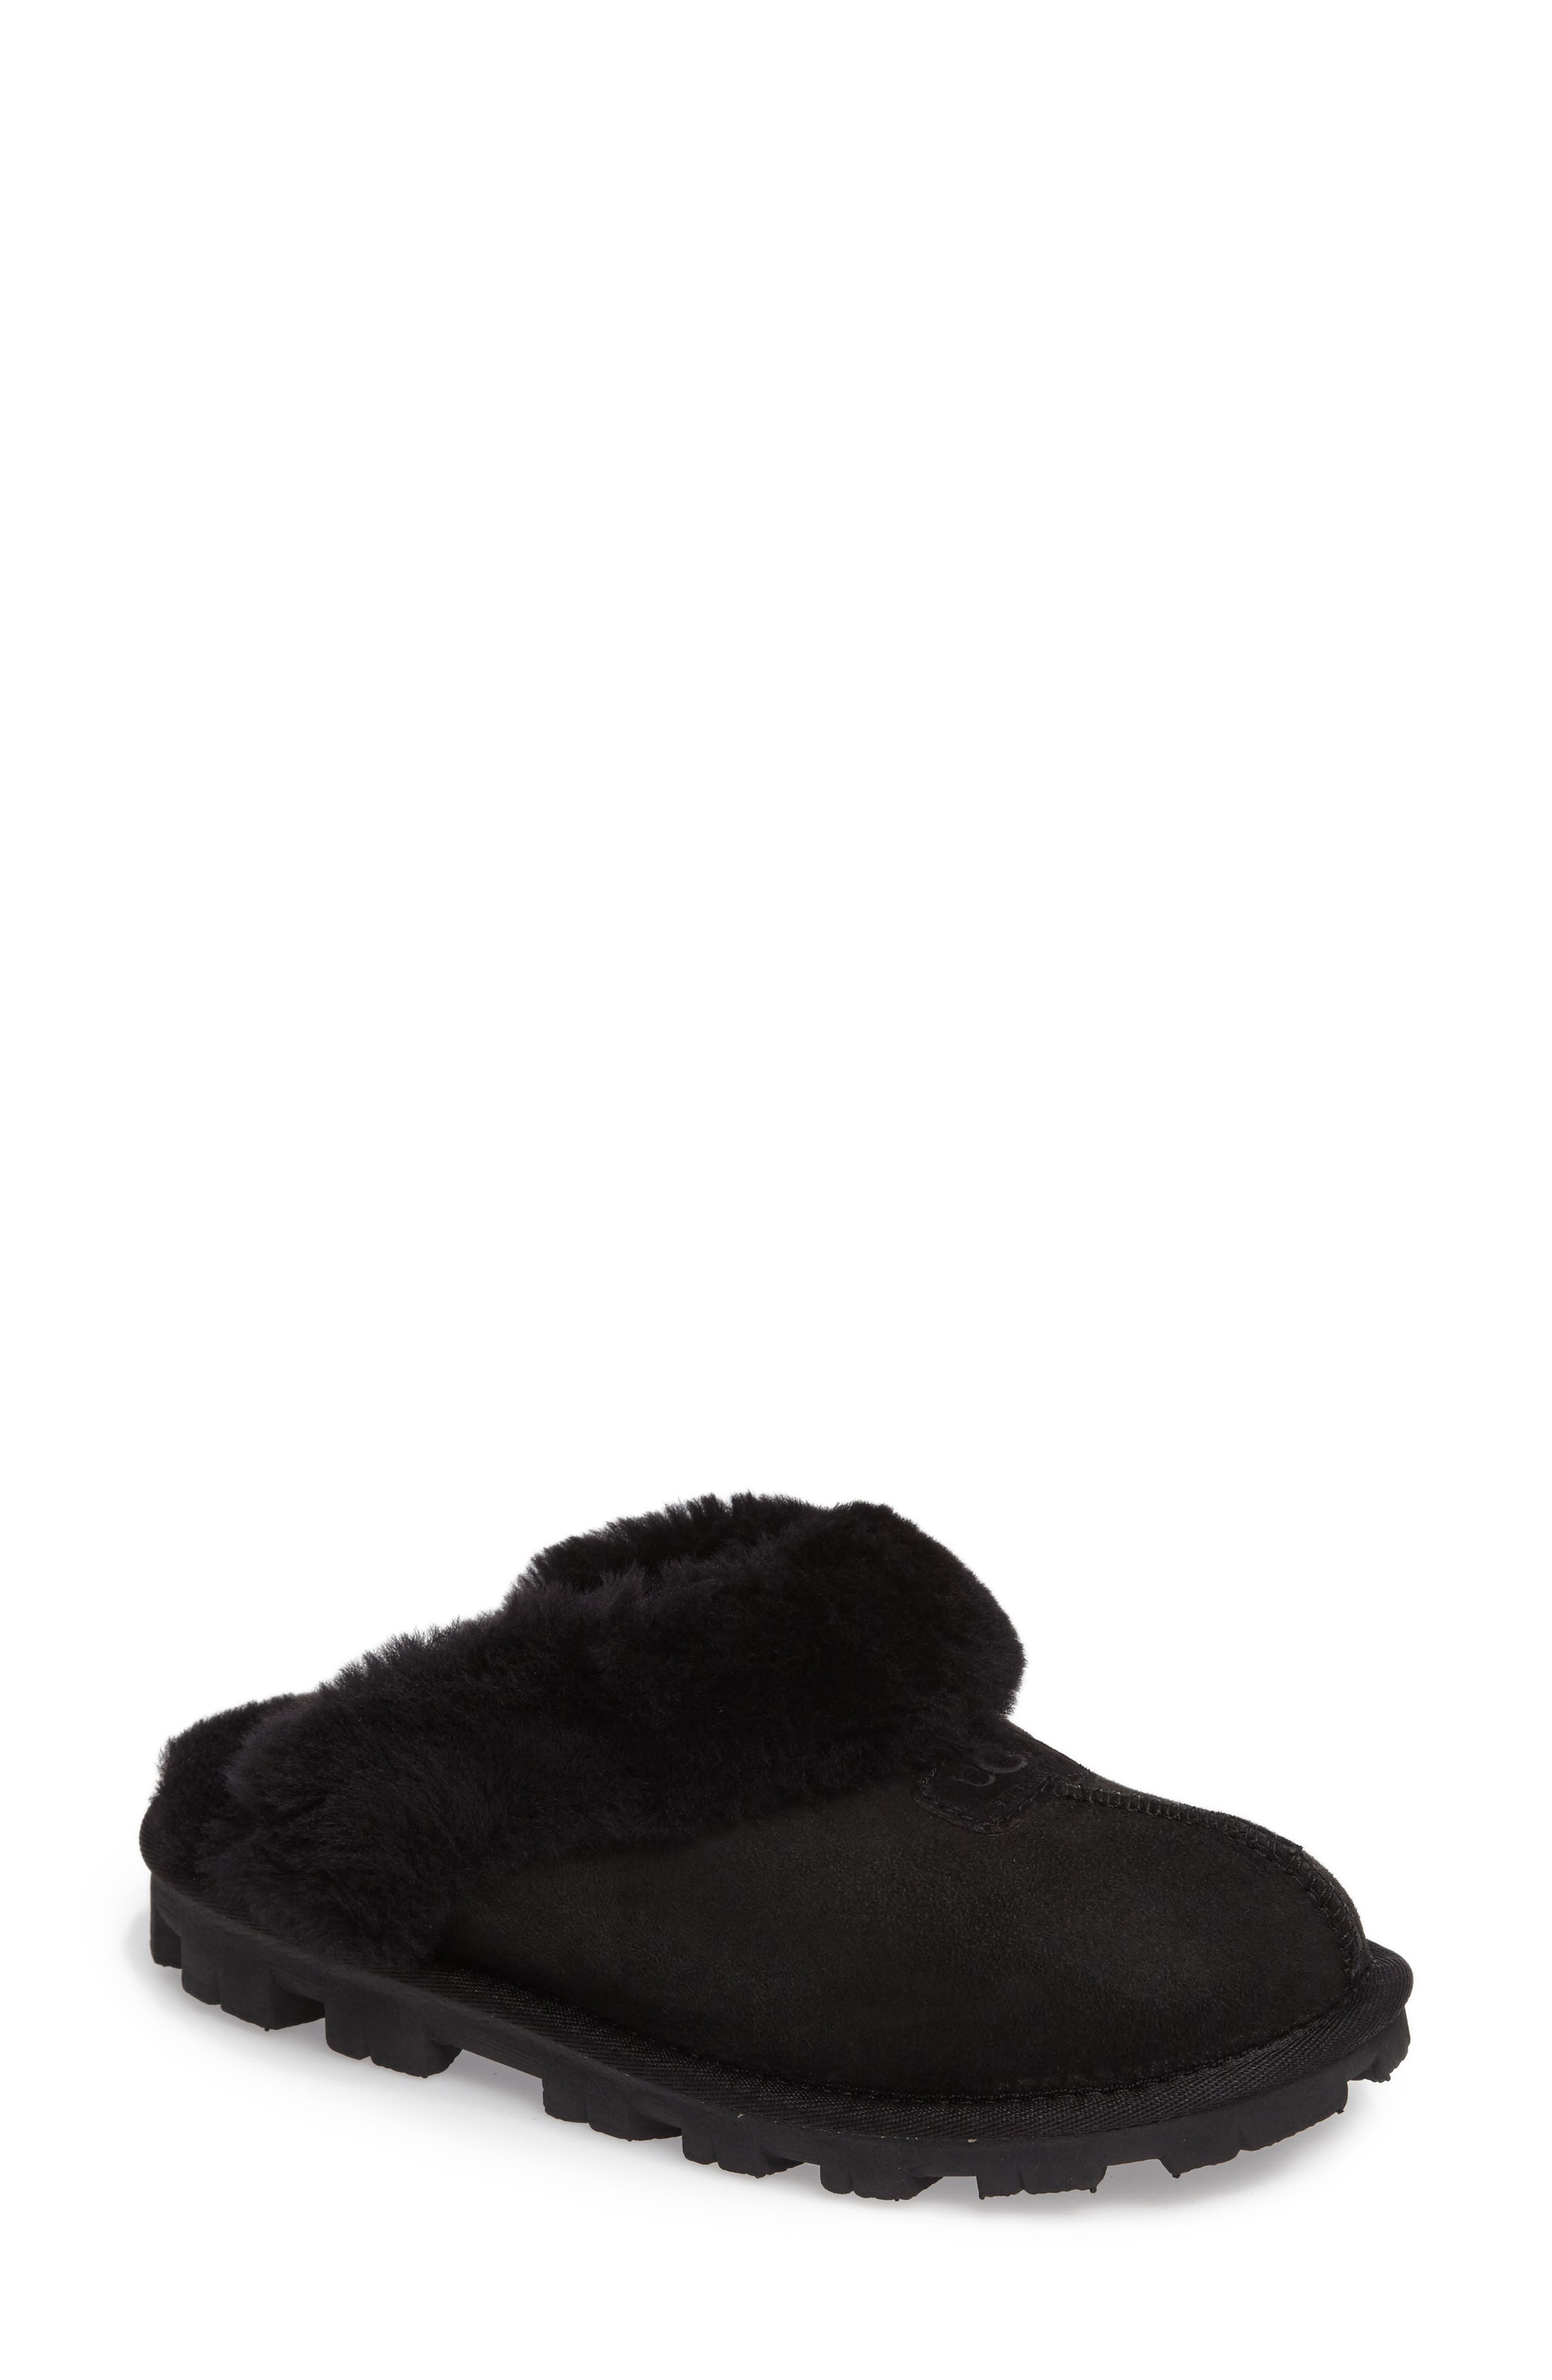 Ugg Genuine Shearling Slipper, Black